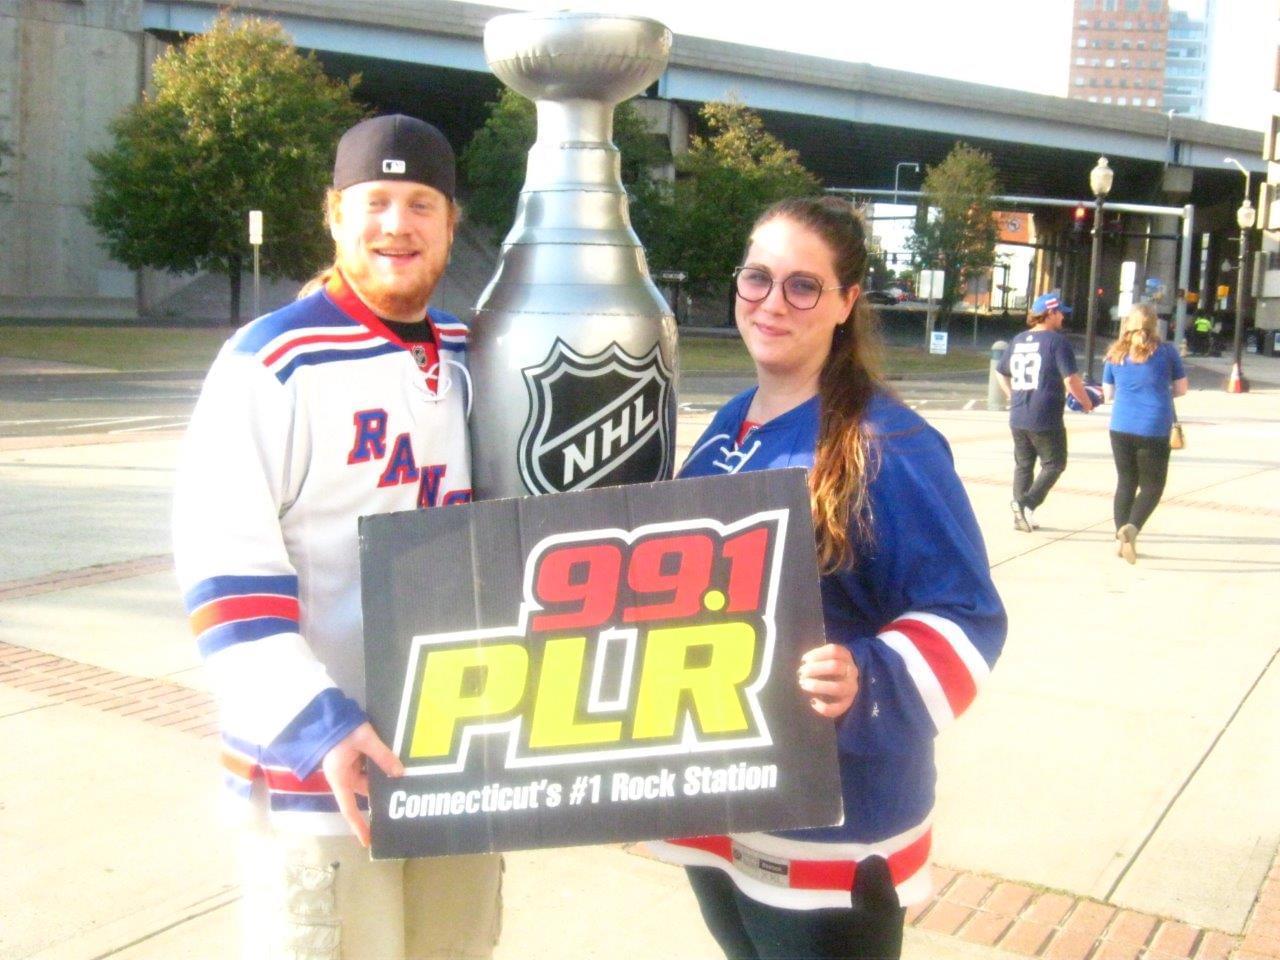 Rangers vs. Islanders at Webster Bank Arena 9/28/19